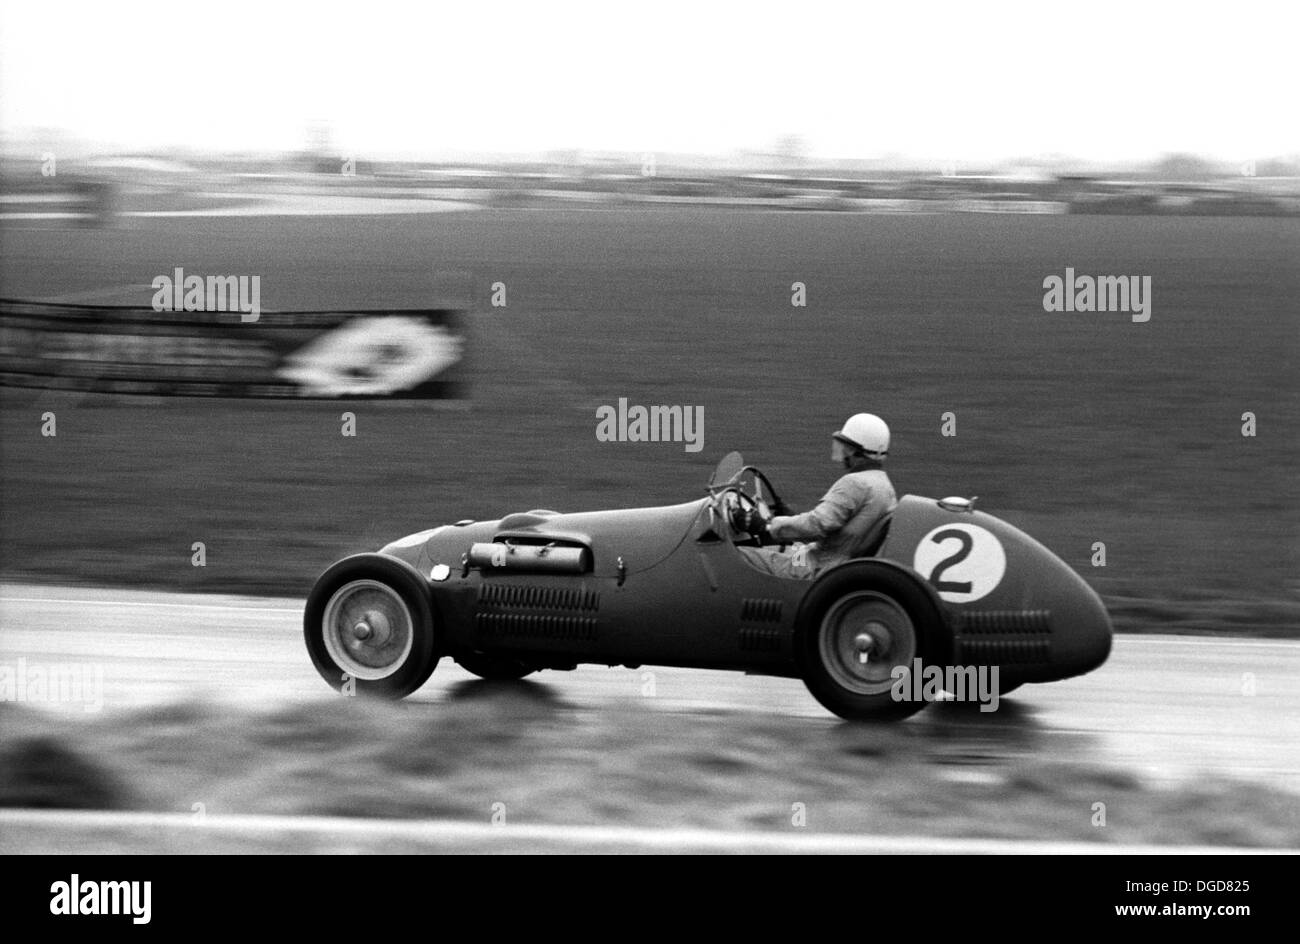 An HWM racing at Goodwood, England, Easter 1951. - Stock Image